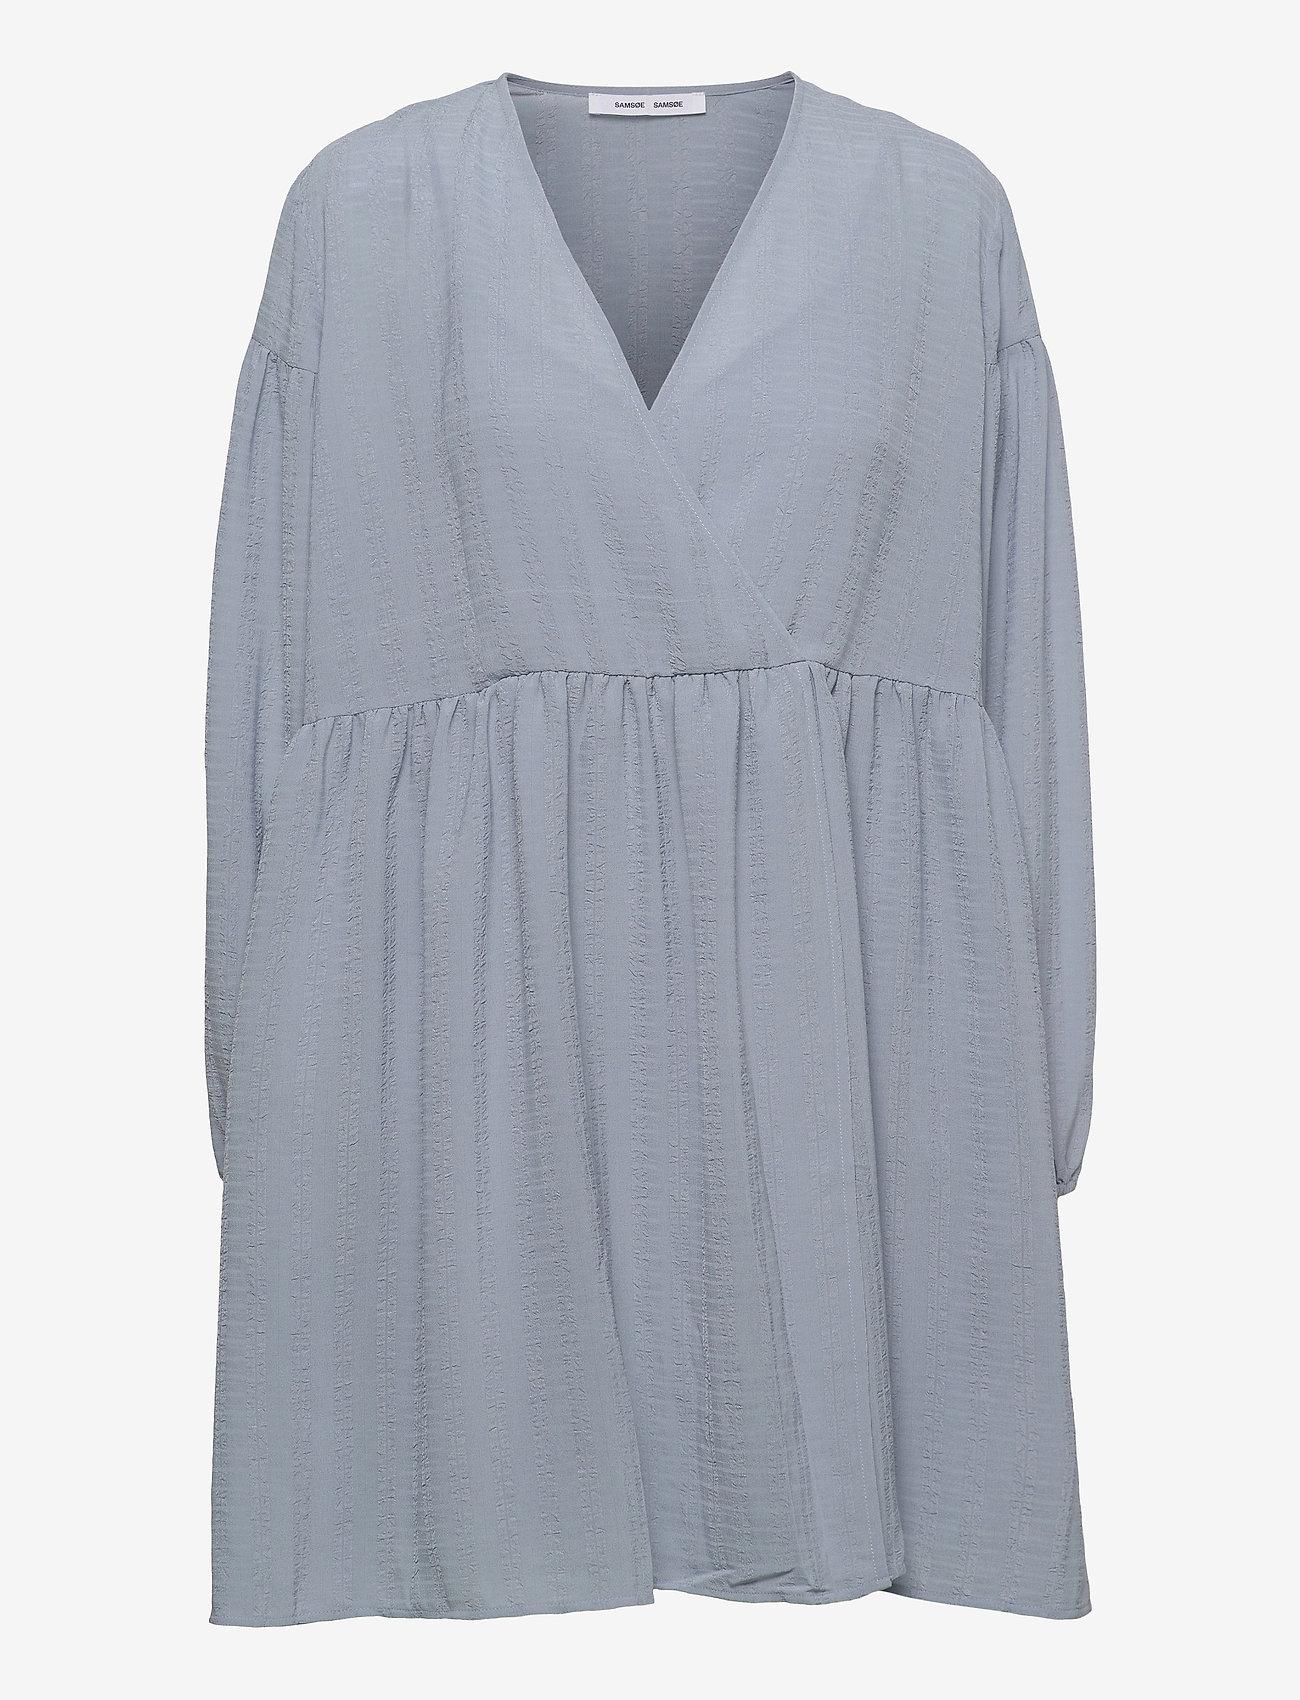 Samsøe Samsøe - Jolie short dress 12697 - summer dresses - dusty blue - 1